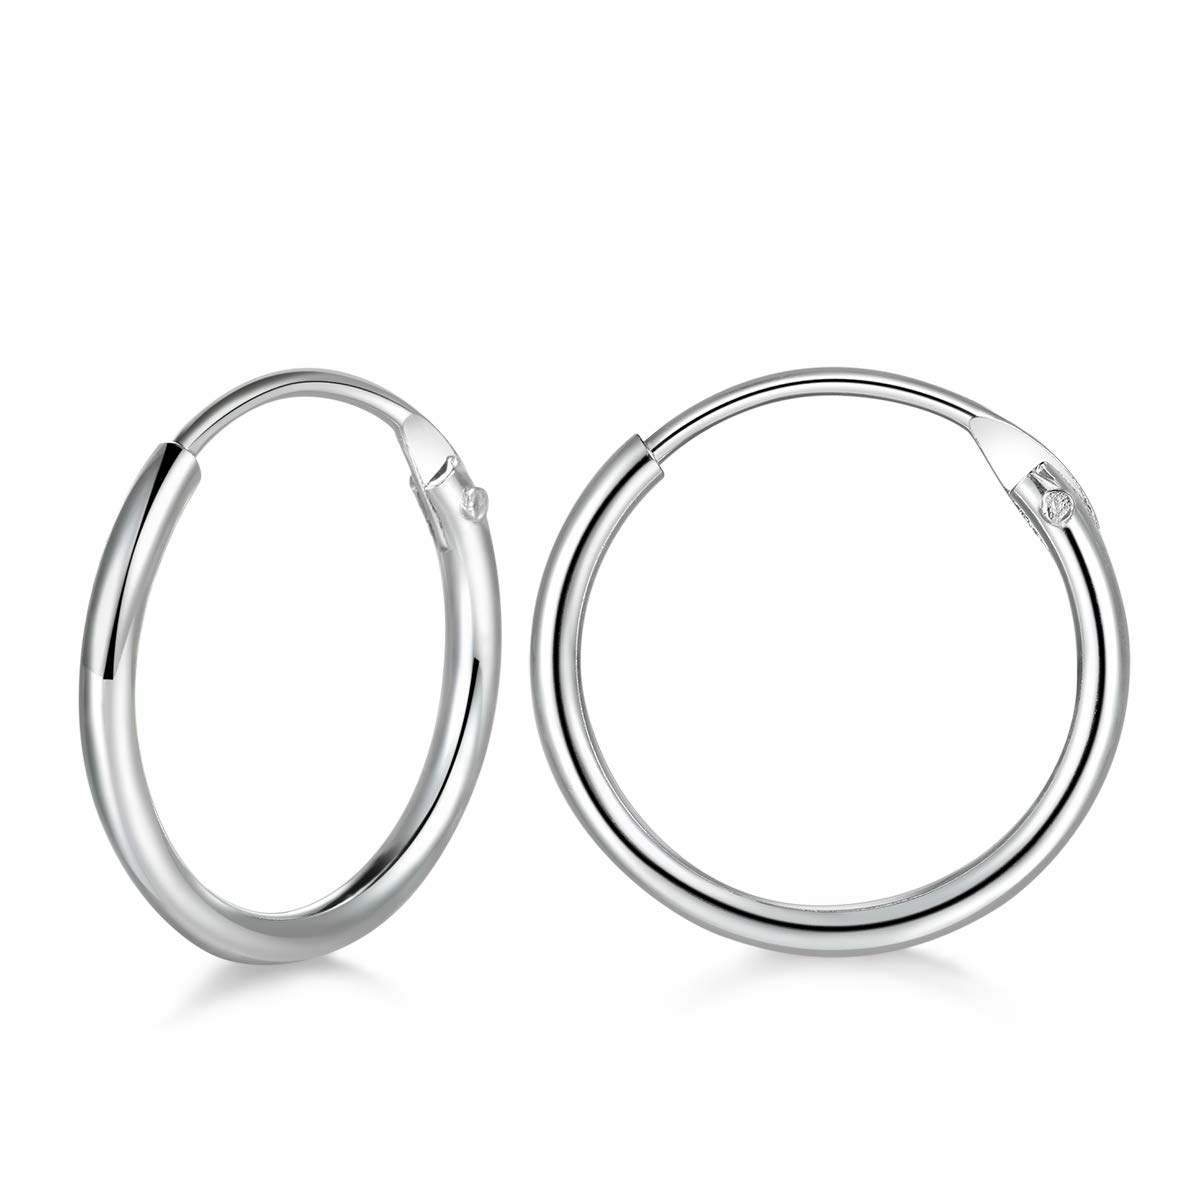 947c4297b Amazon.com: 925 Sterling Silver 10mm Small Hoop Earrings Hypoallergenic  Unisex Endless Cartilage Earrings Body Piercing Nose Lip Rings for Women  Men Girls: ...